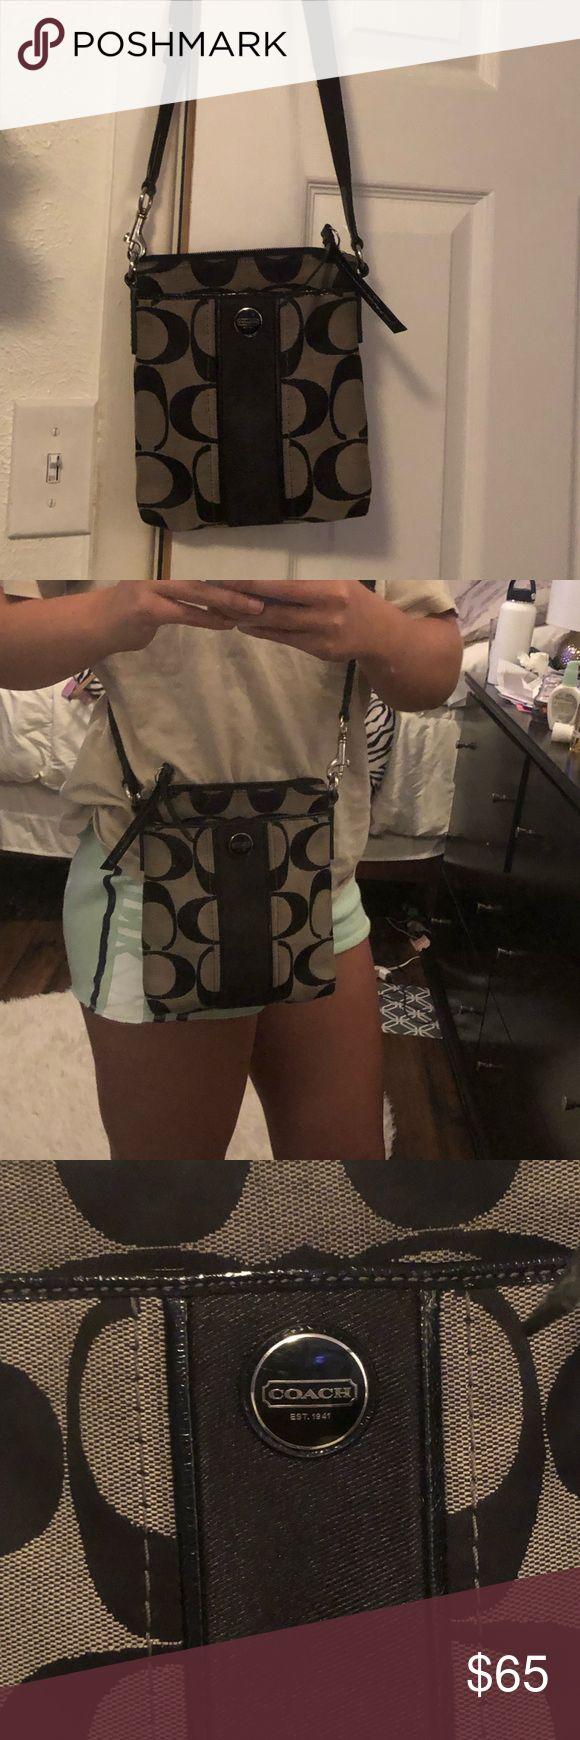 cute-purses-that-say-destiny-women-tampon